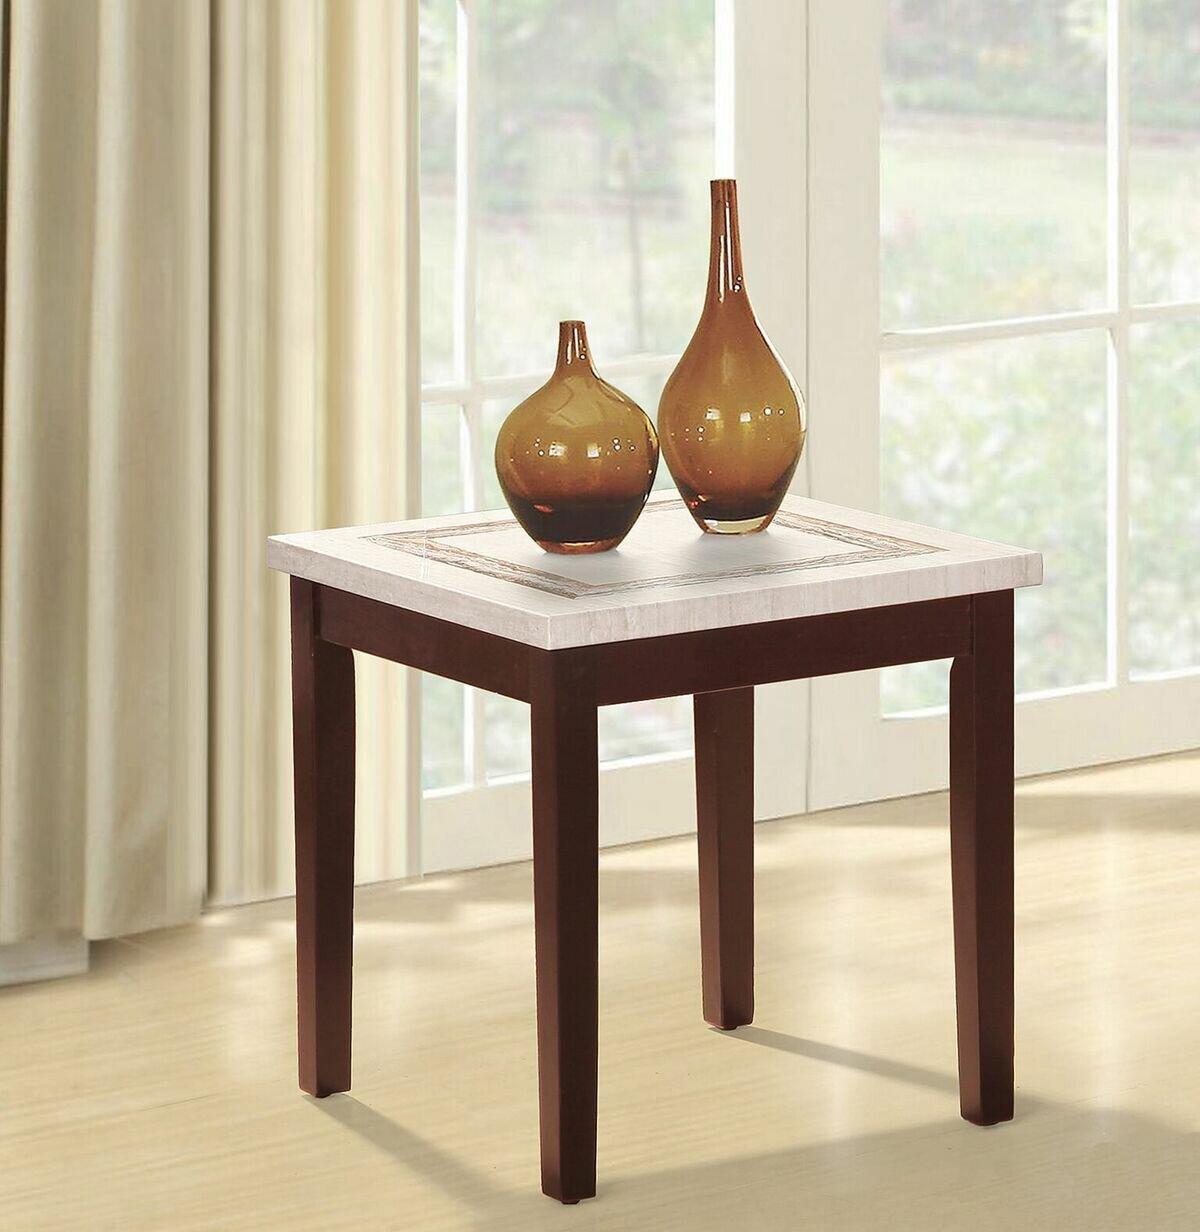 Red Barrel Studio Mccune Faux Marbelized Granite End Table Wayfair Ca